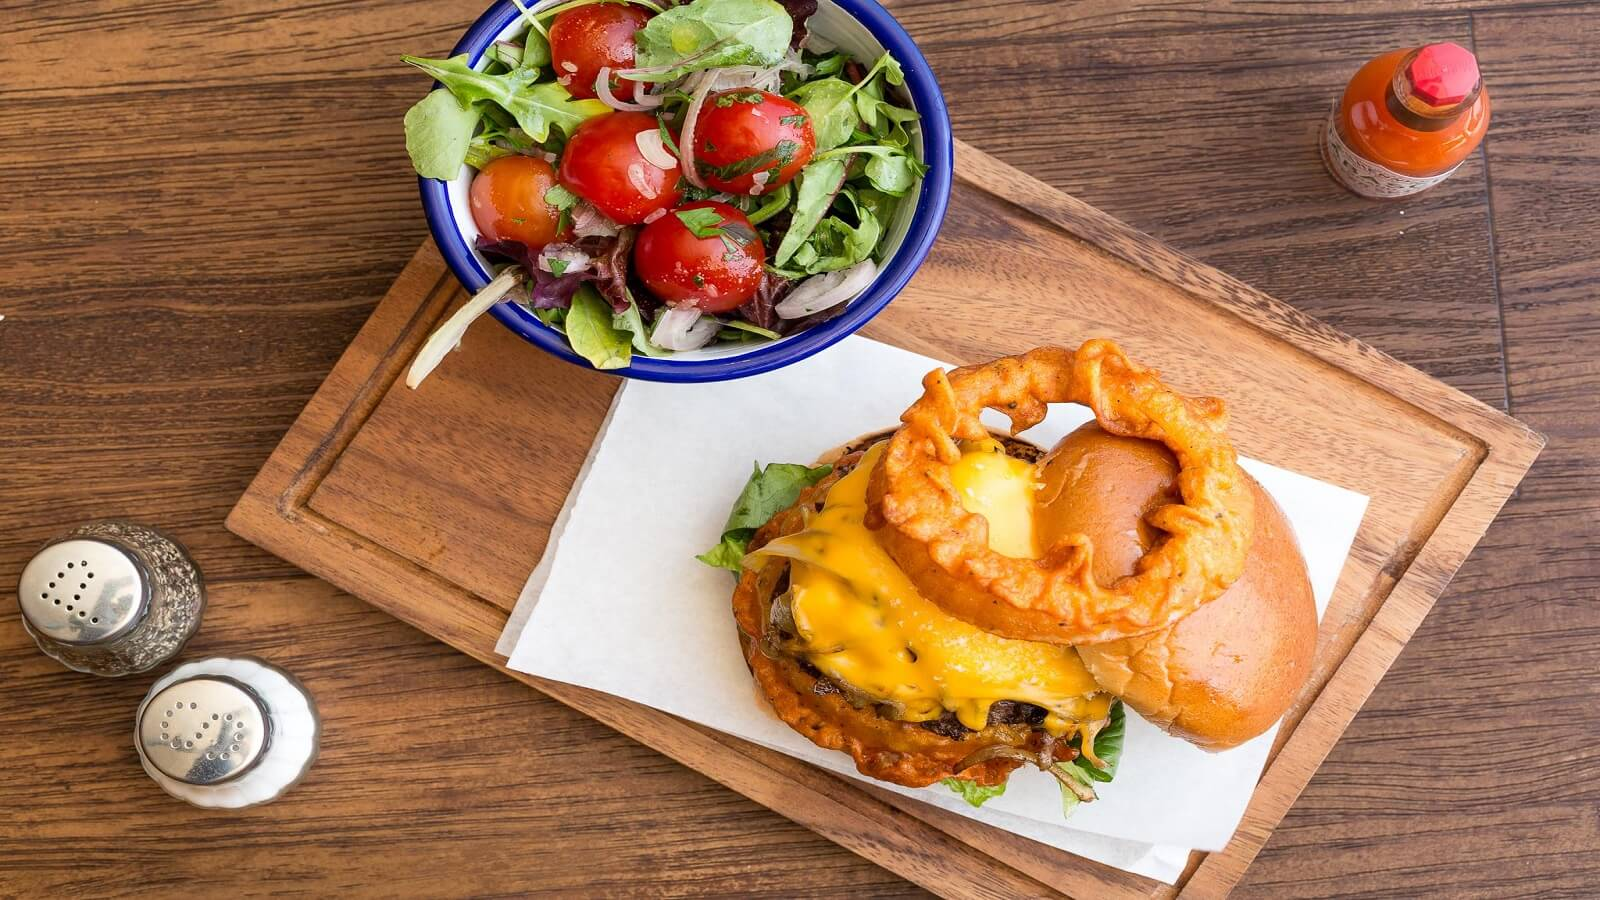 Farm Fresh Burgers and Shakes